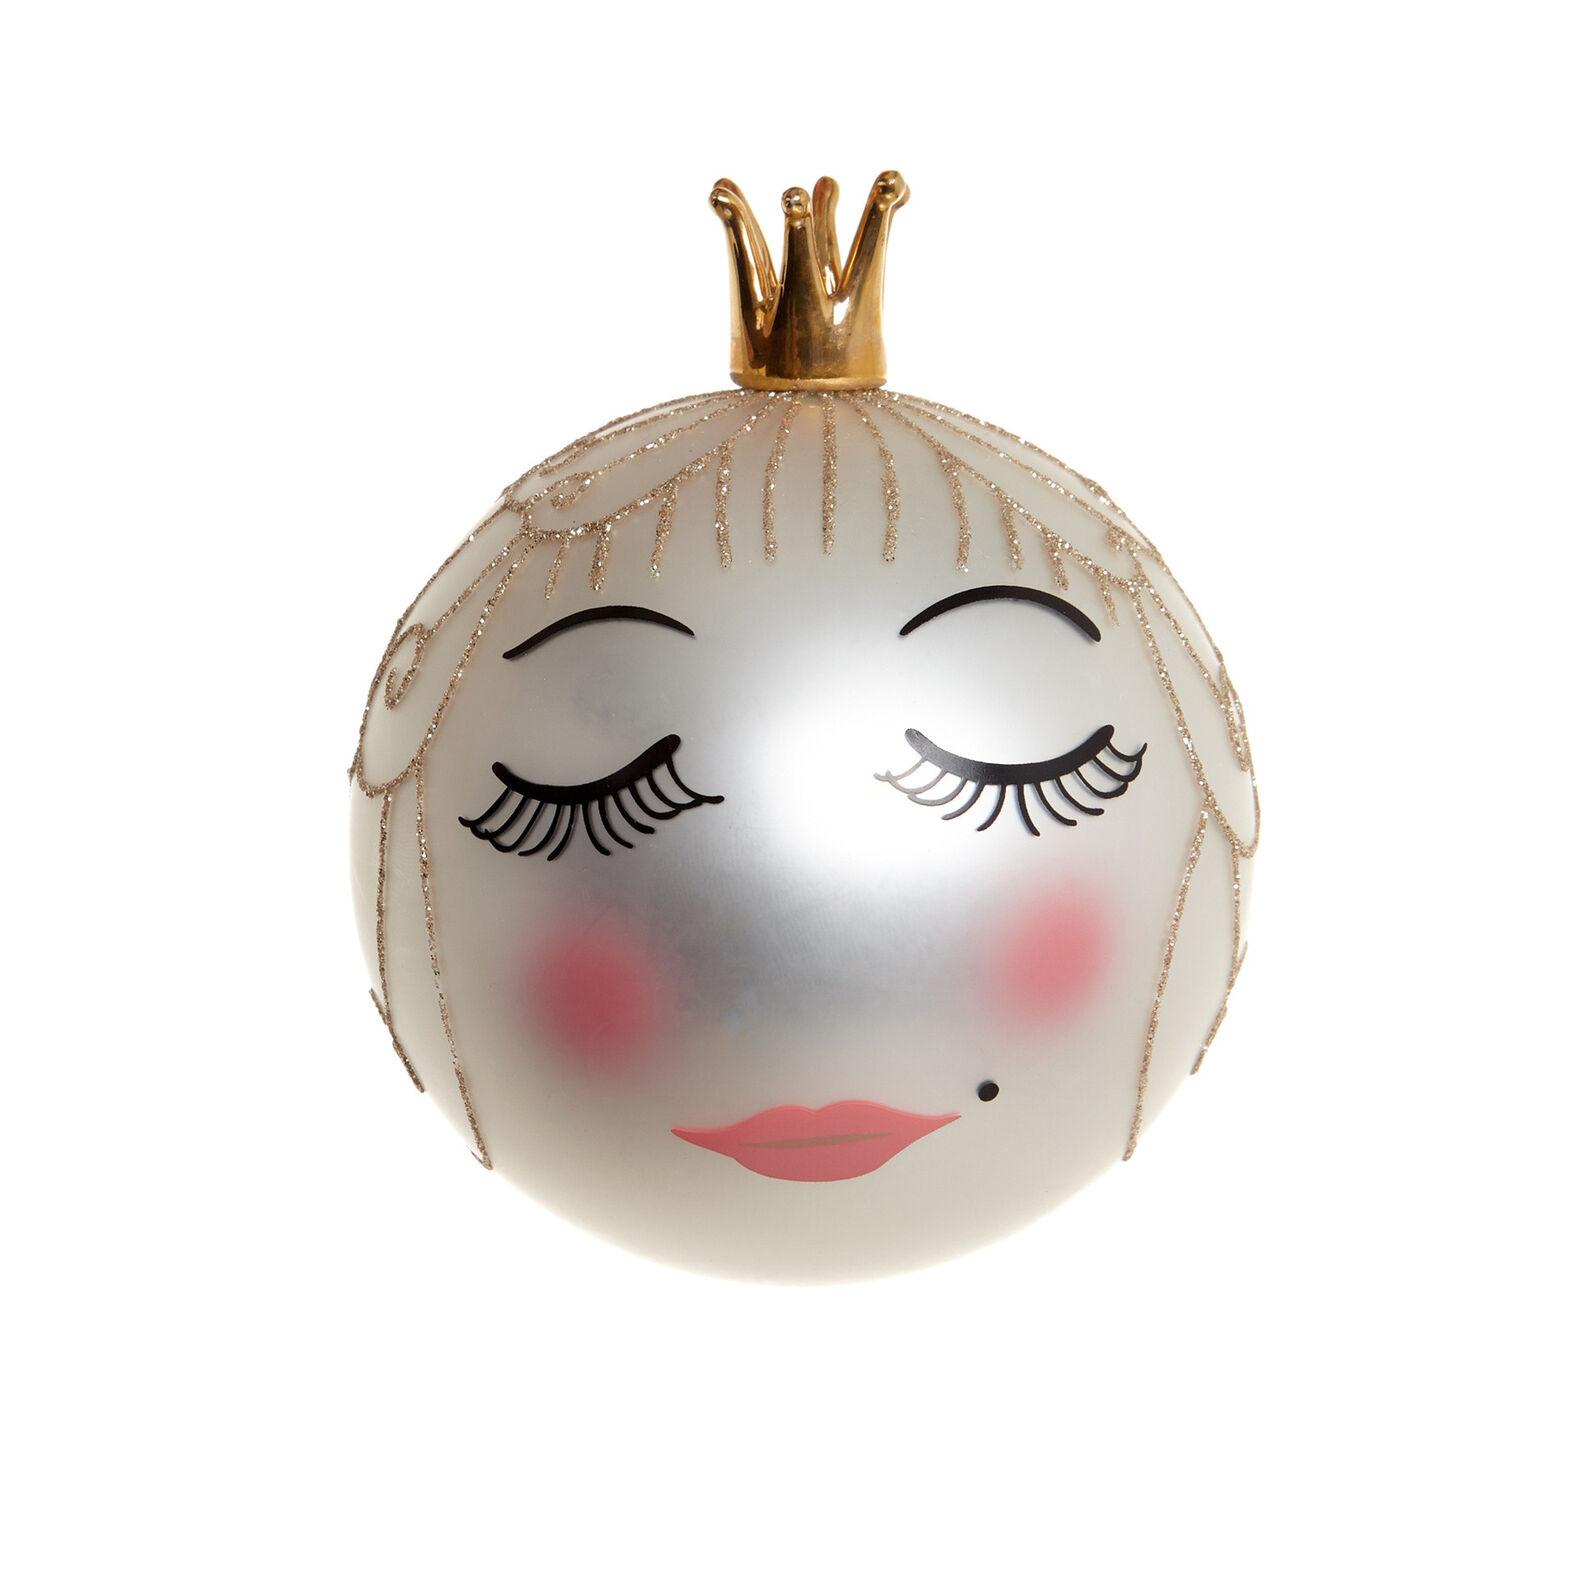 Hand-decorated Queen bauble